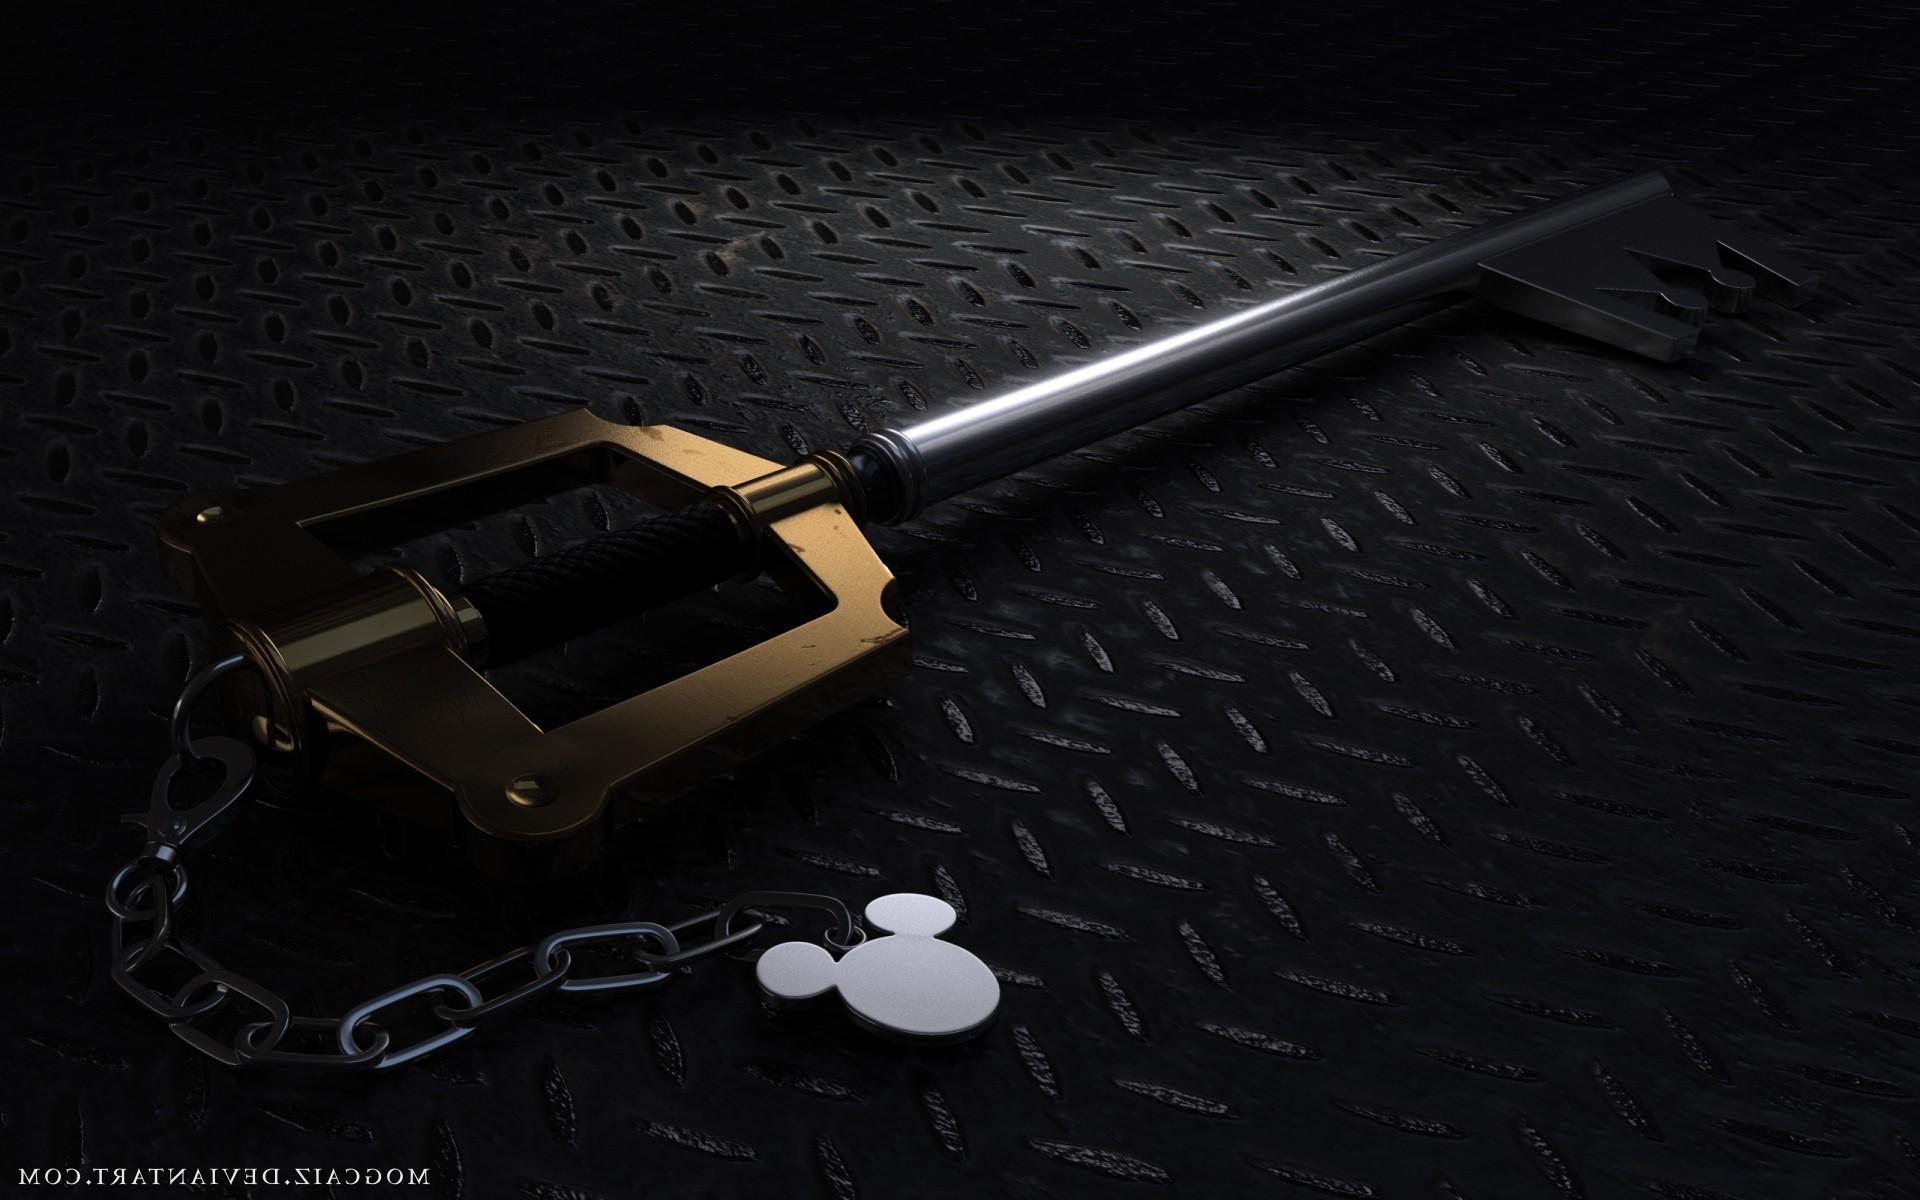 Simple Wallpaper Mac Kingdom Hearts - 228142  Image_32457.jpg